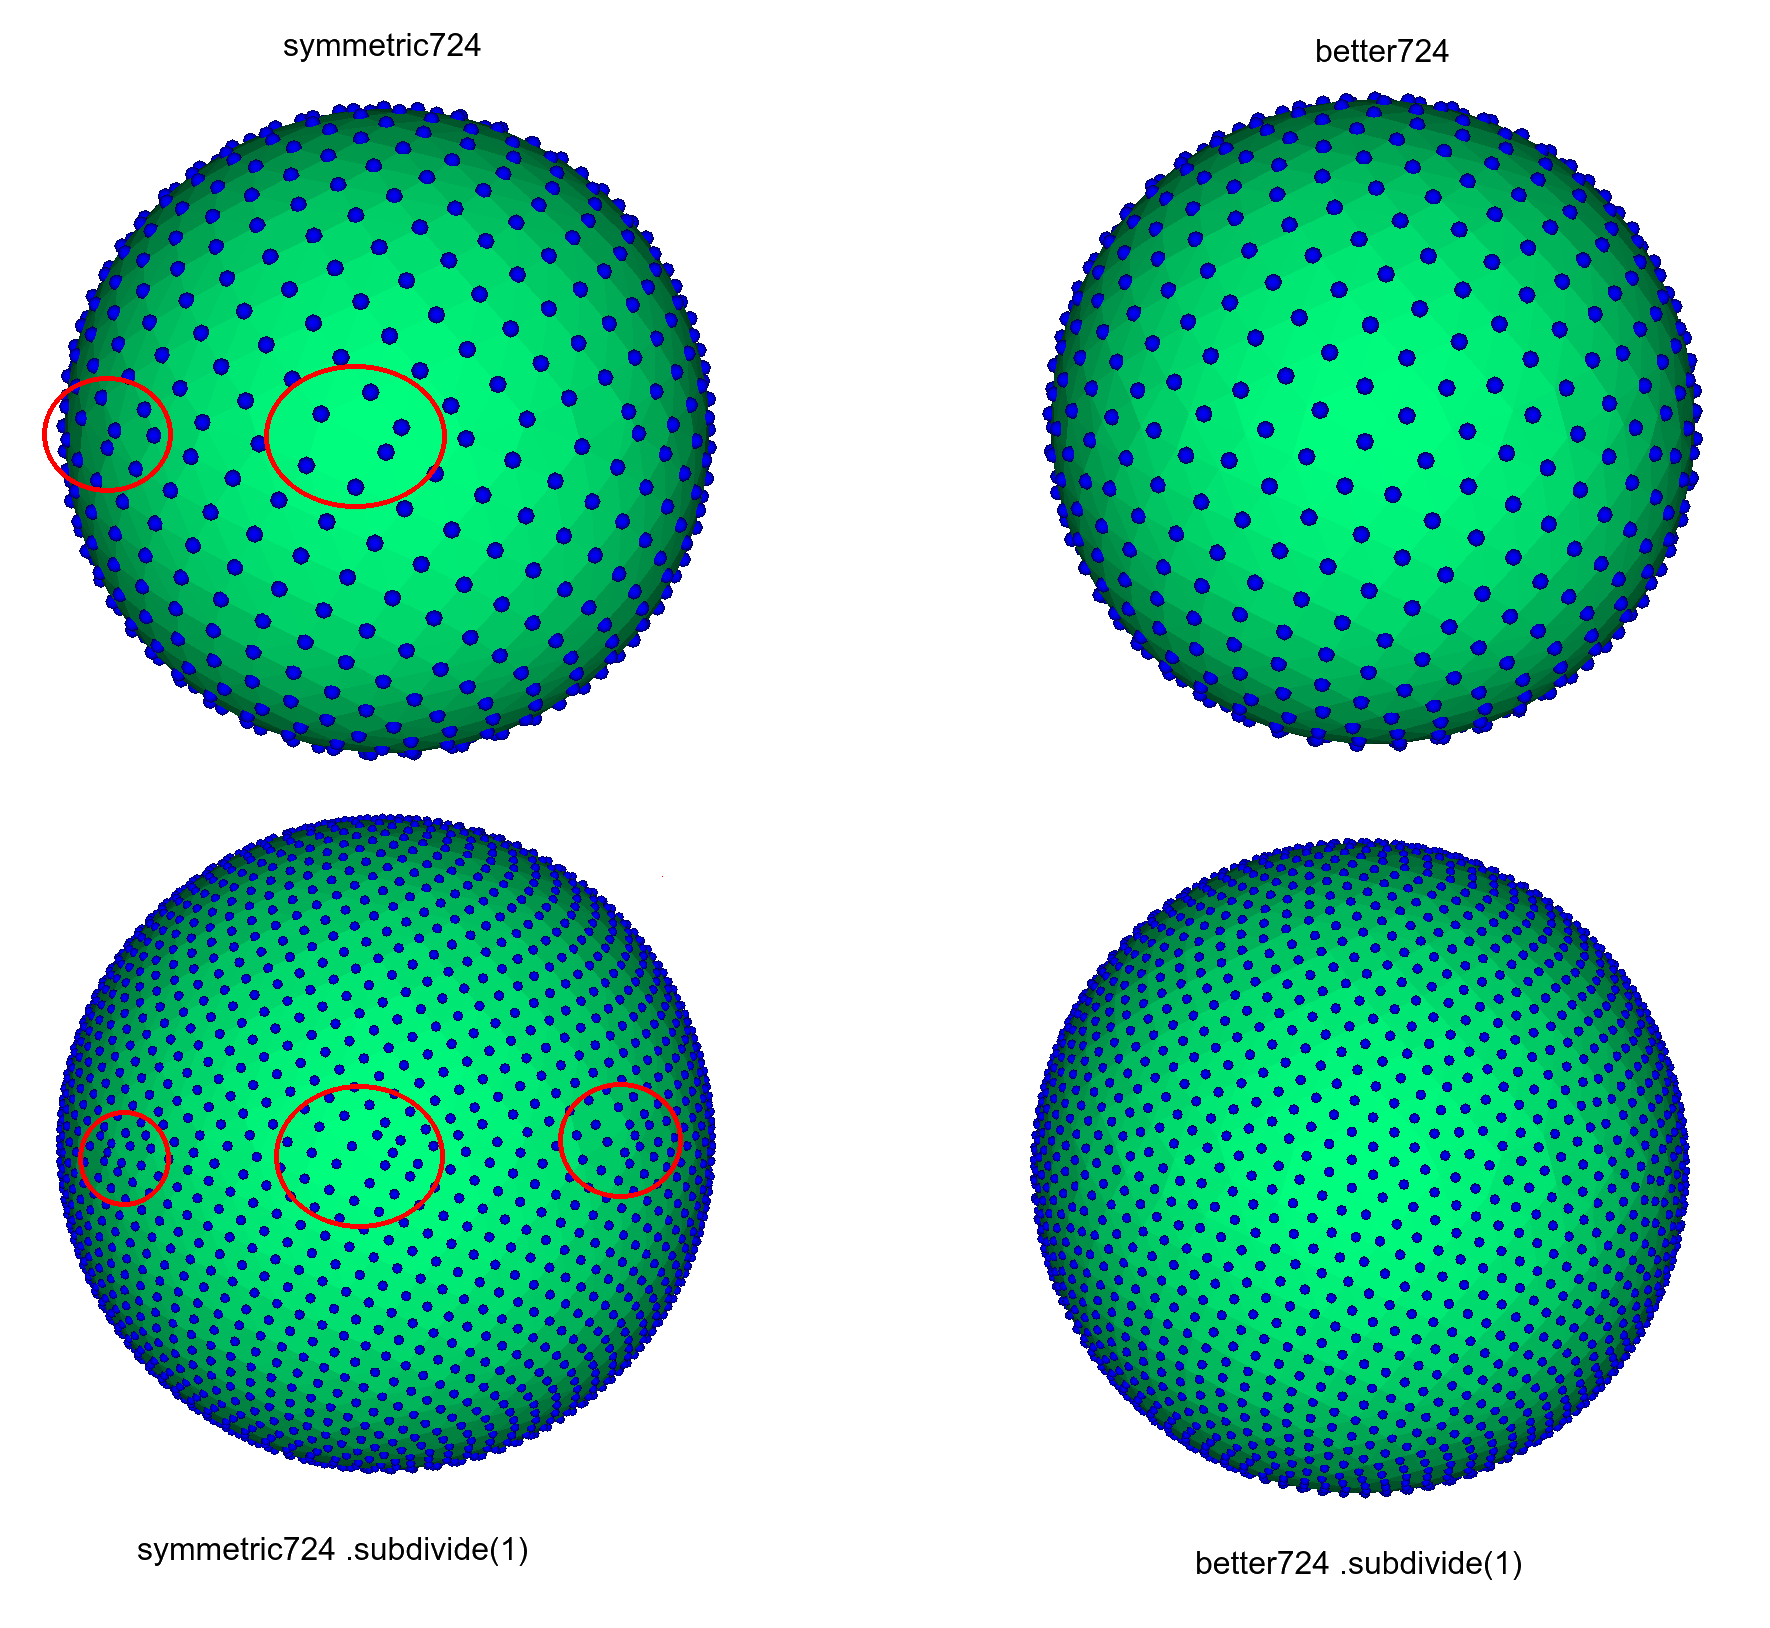 sphere_symmetric724_equator_uneveness